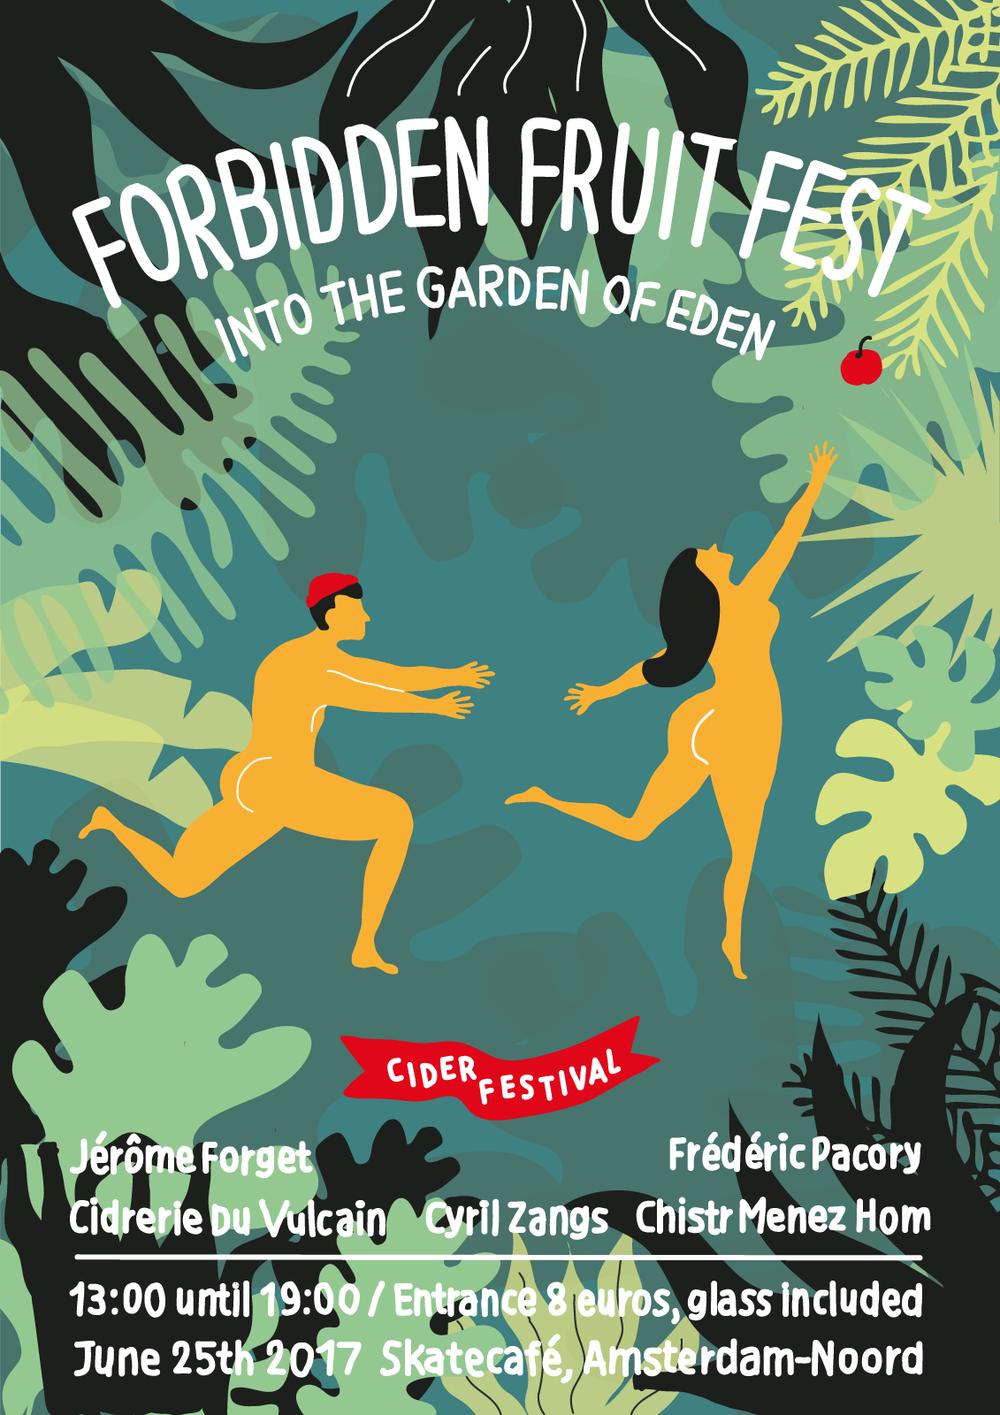 Forbidden Fruit Fest